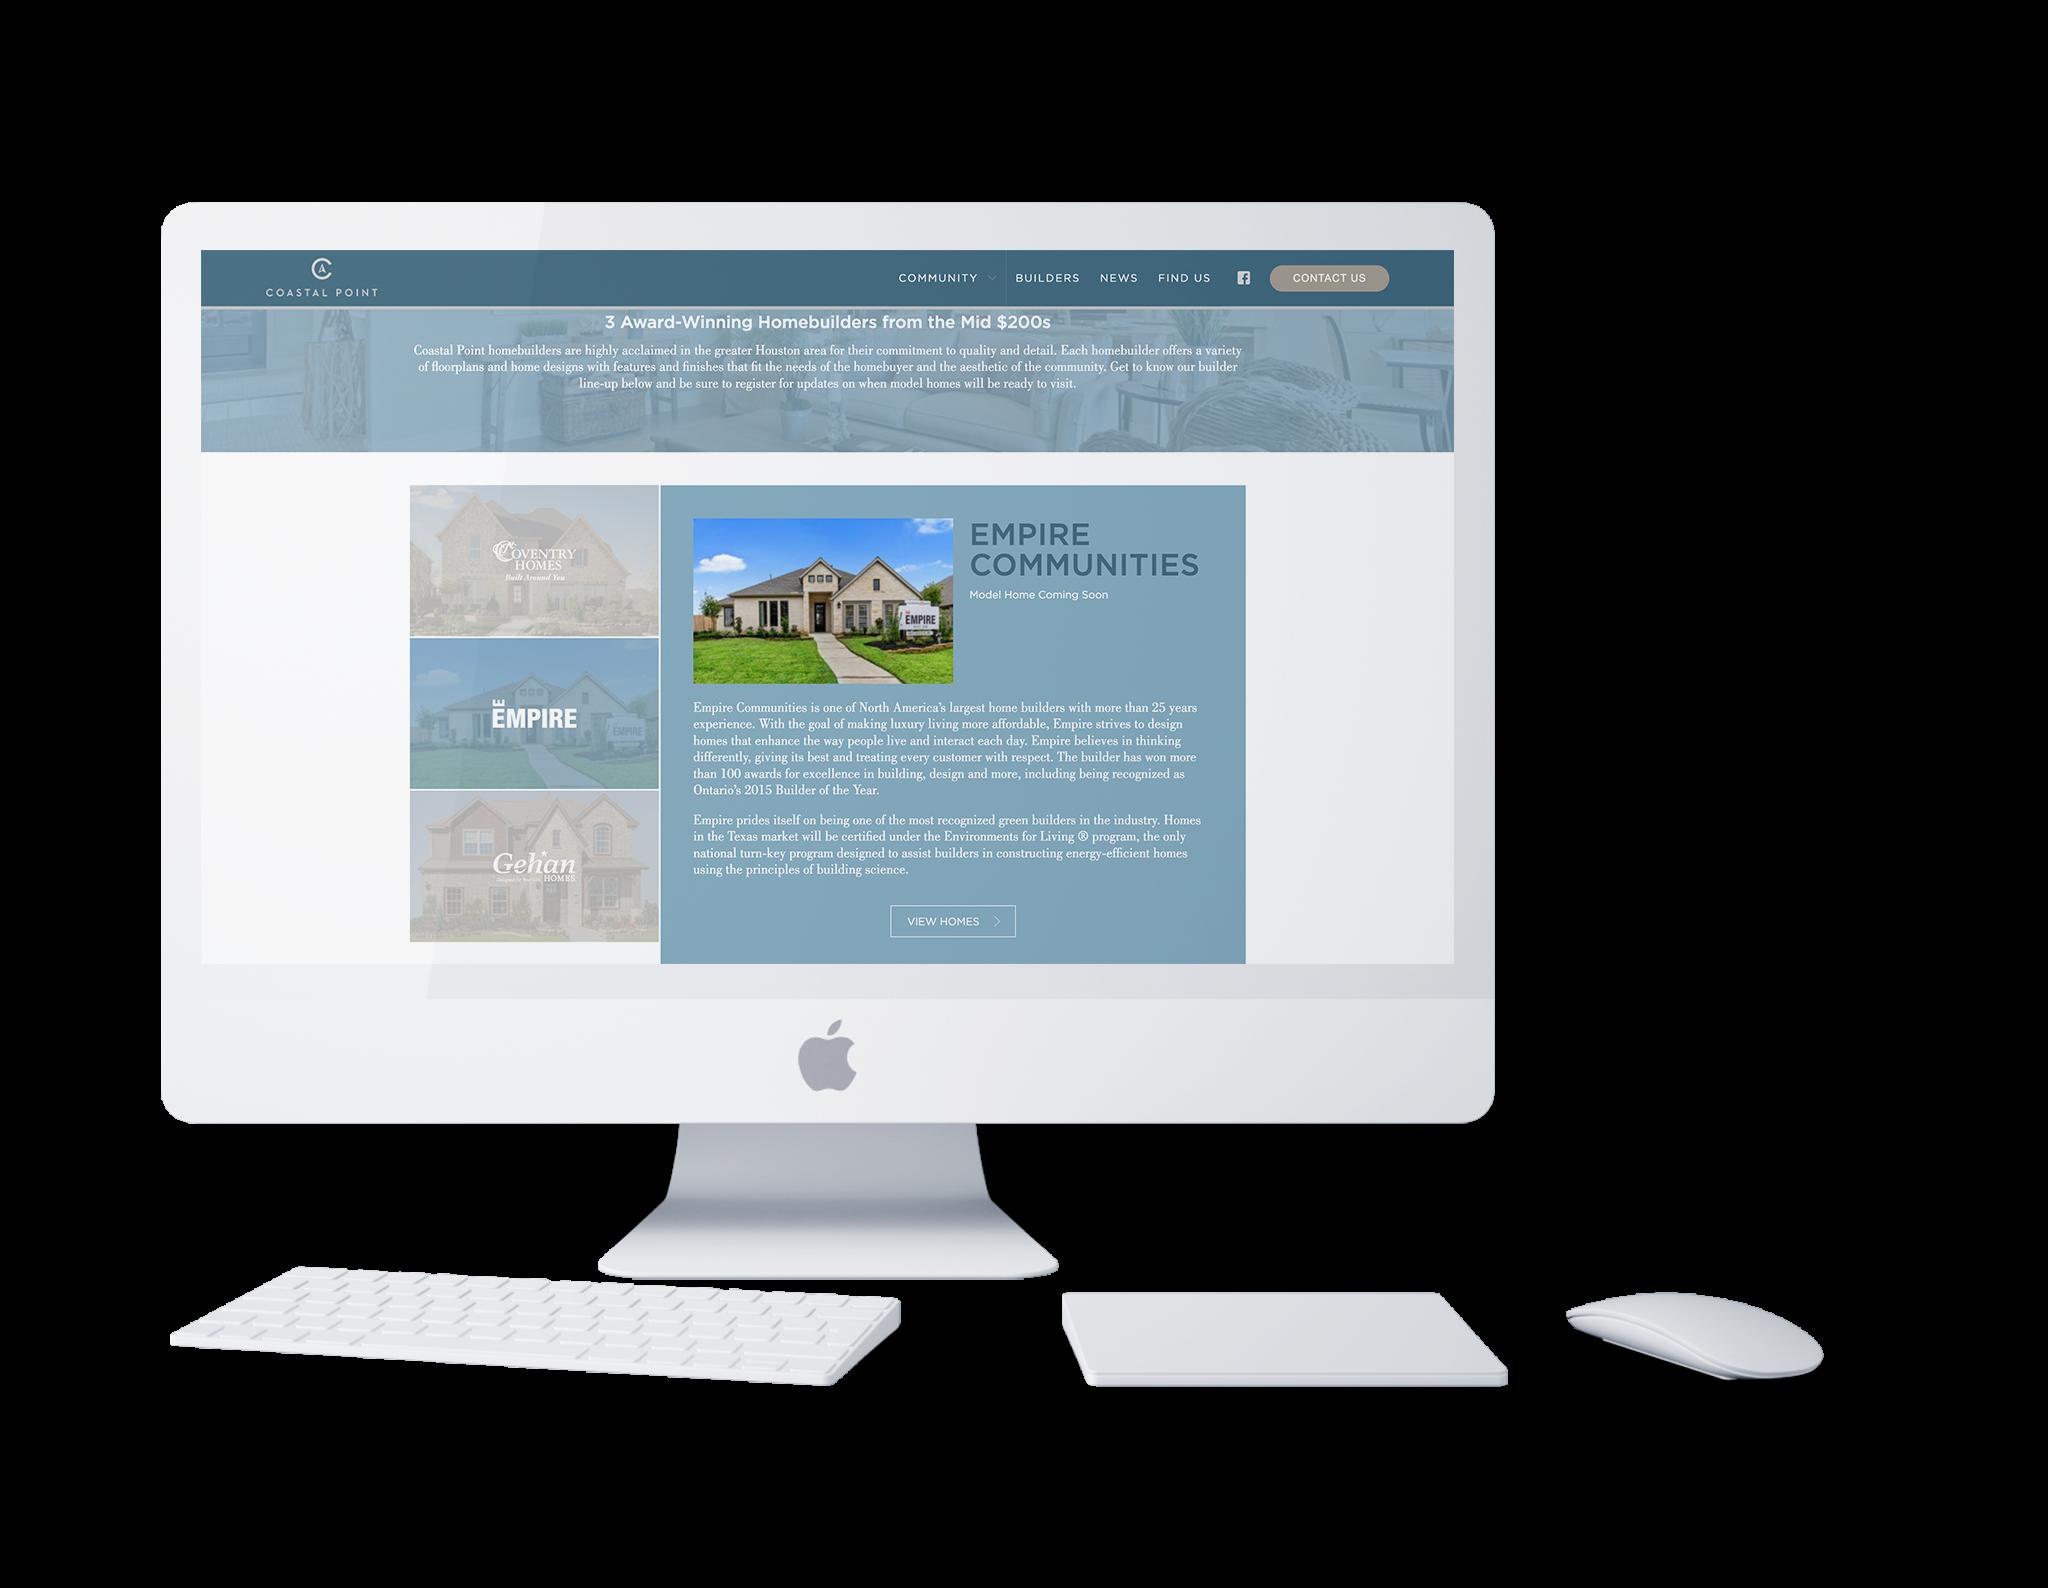 LOCAL-AMENITIES-MOBILE-MENU-COMMUNITY-HOUSES-HOMES-LAKE-BLOG-NEWS-BUILDERS